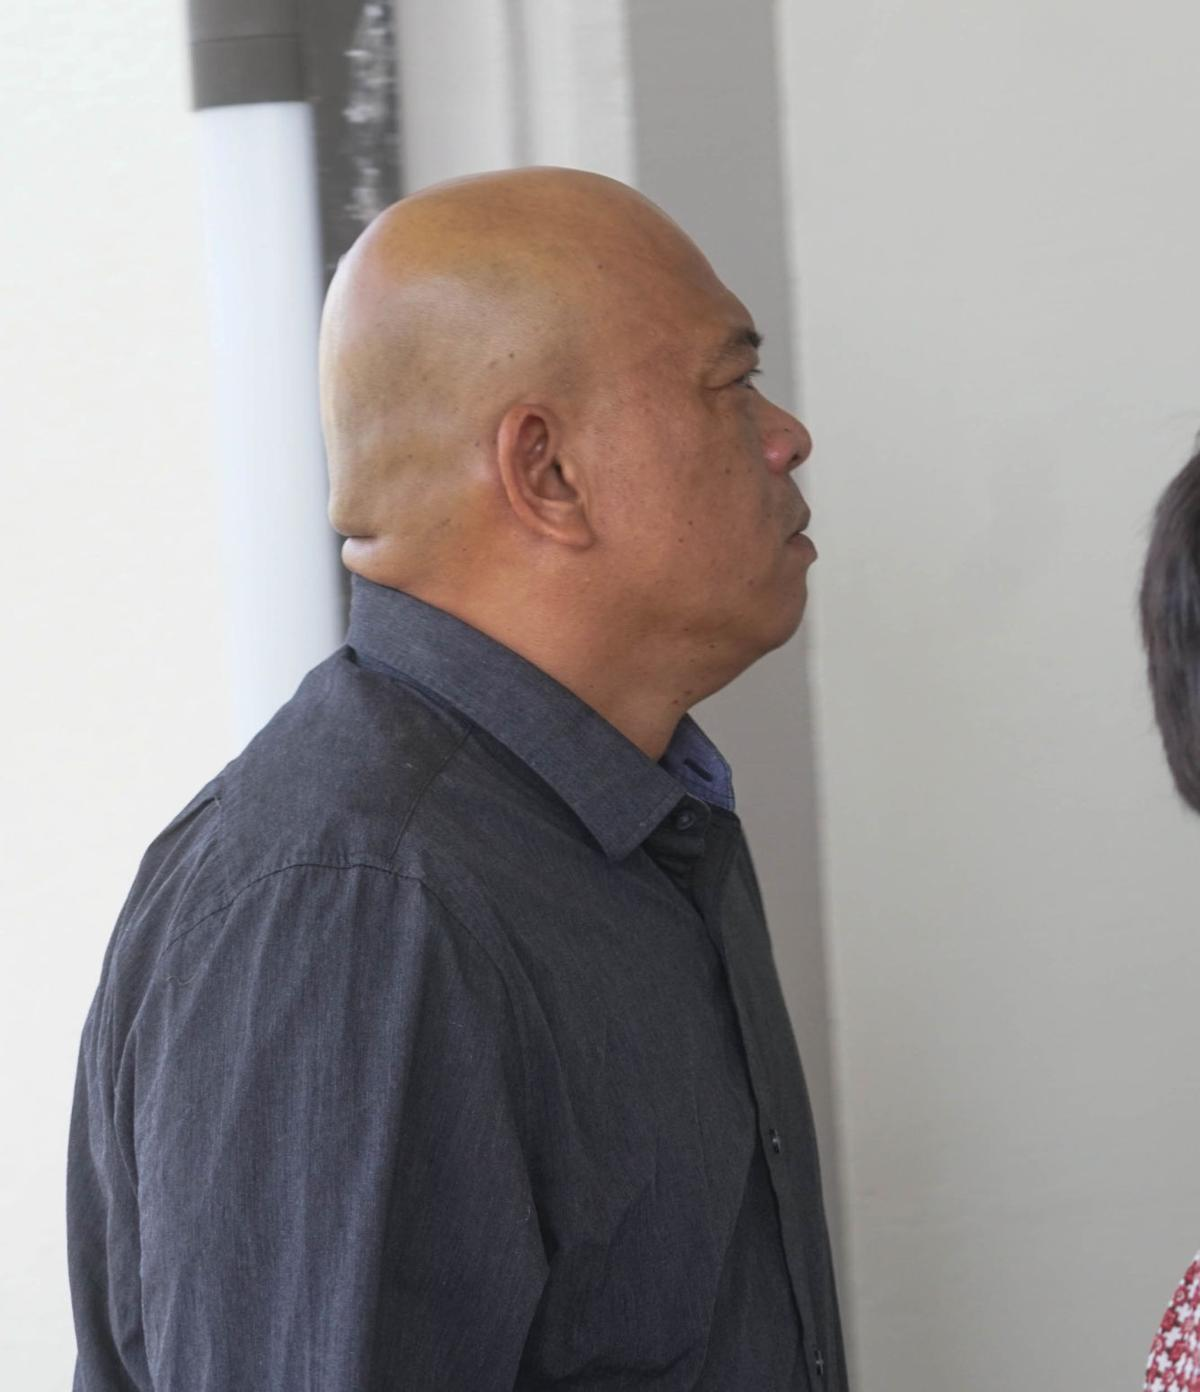 Ex-Customs agent 'turned a blind eye'